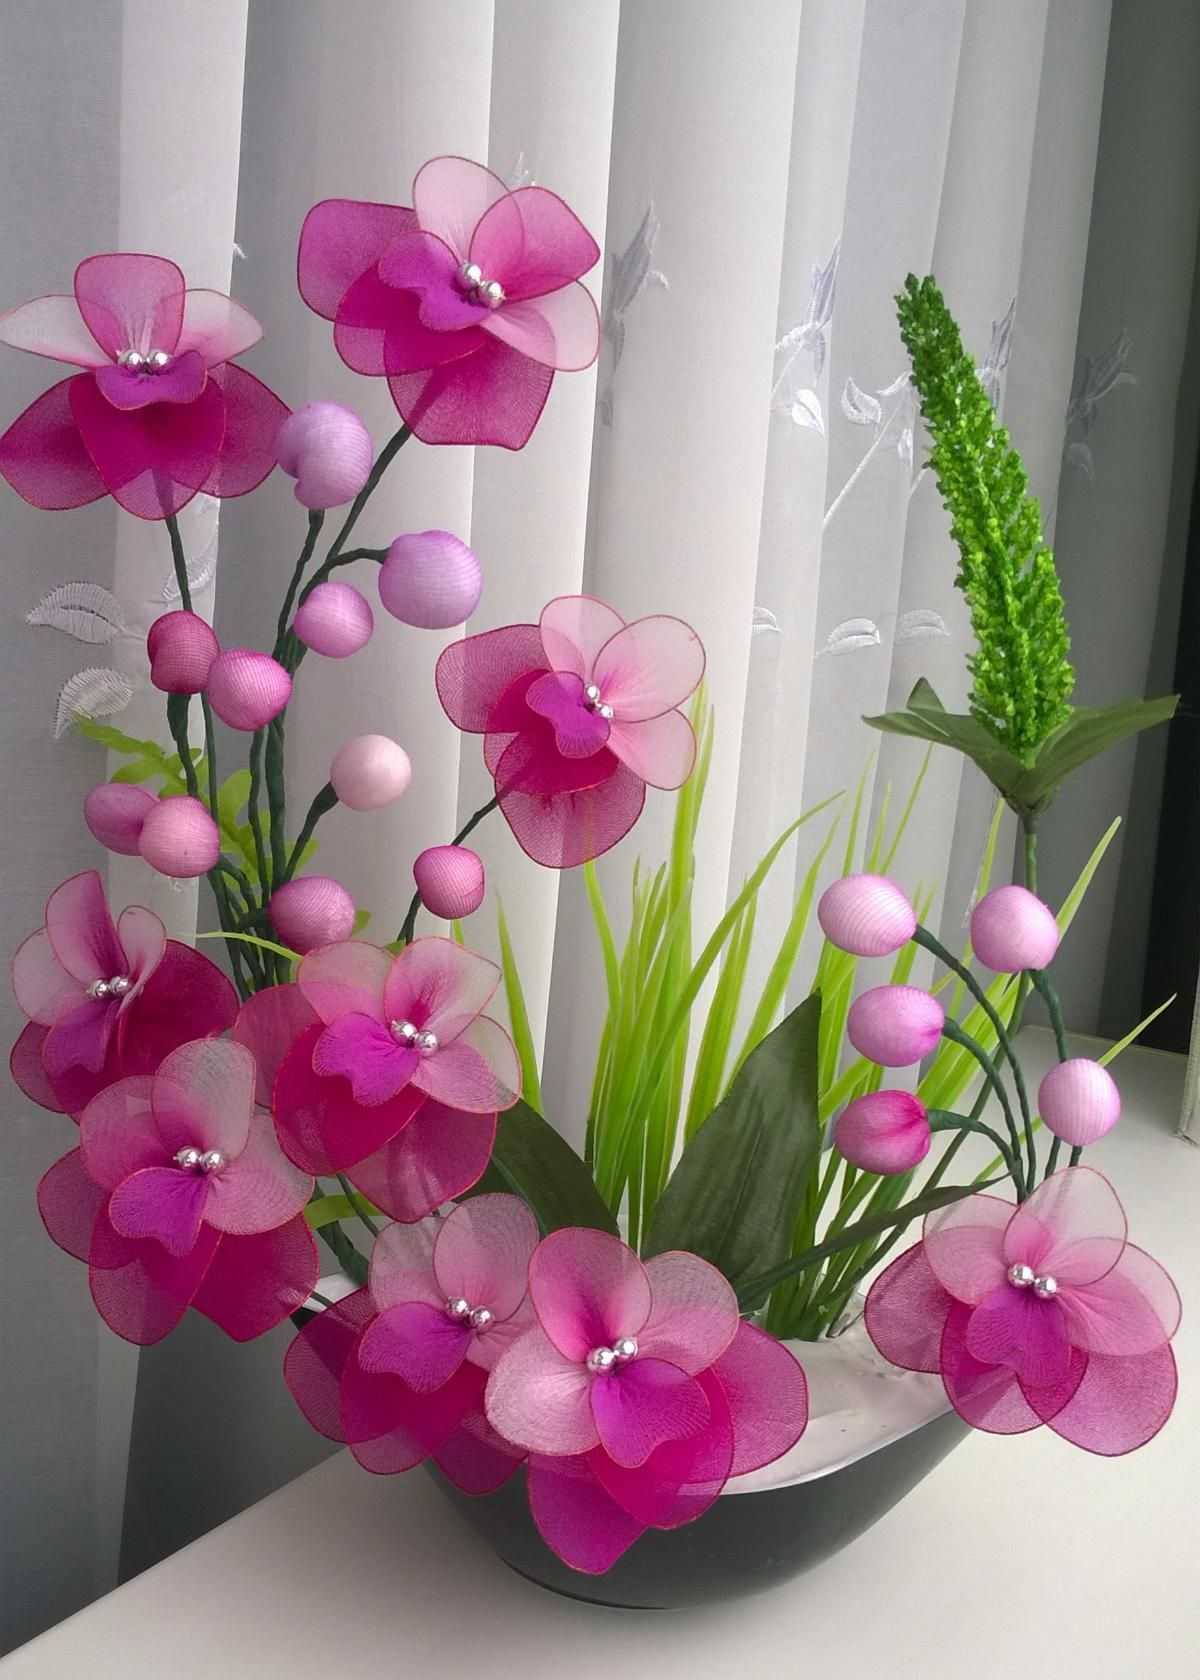 Pin by beata drapaluk on kwiaty pinterest nylon flowers beautiful stocking flowers and beads izmirmasajfo